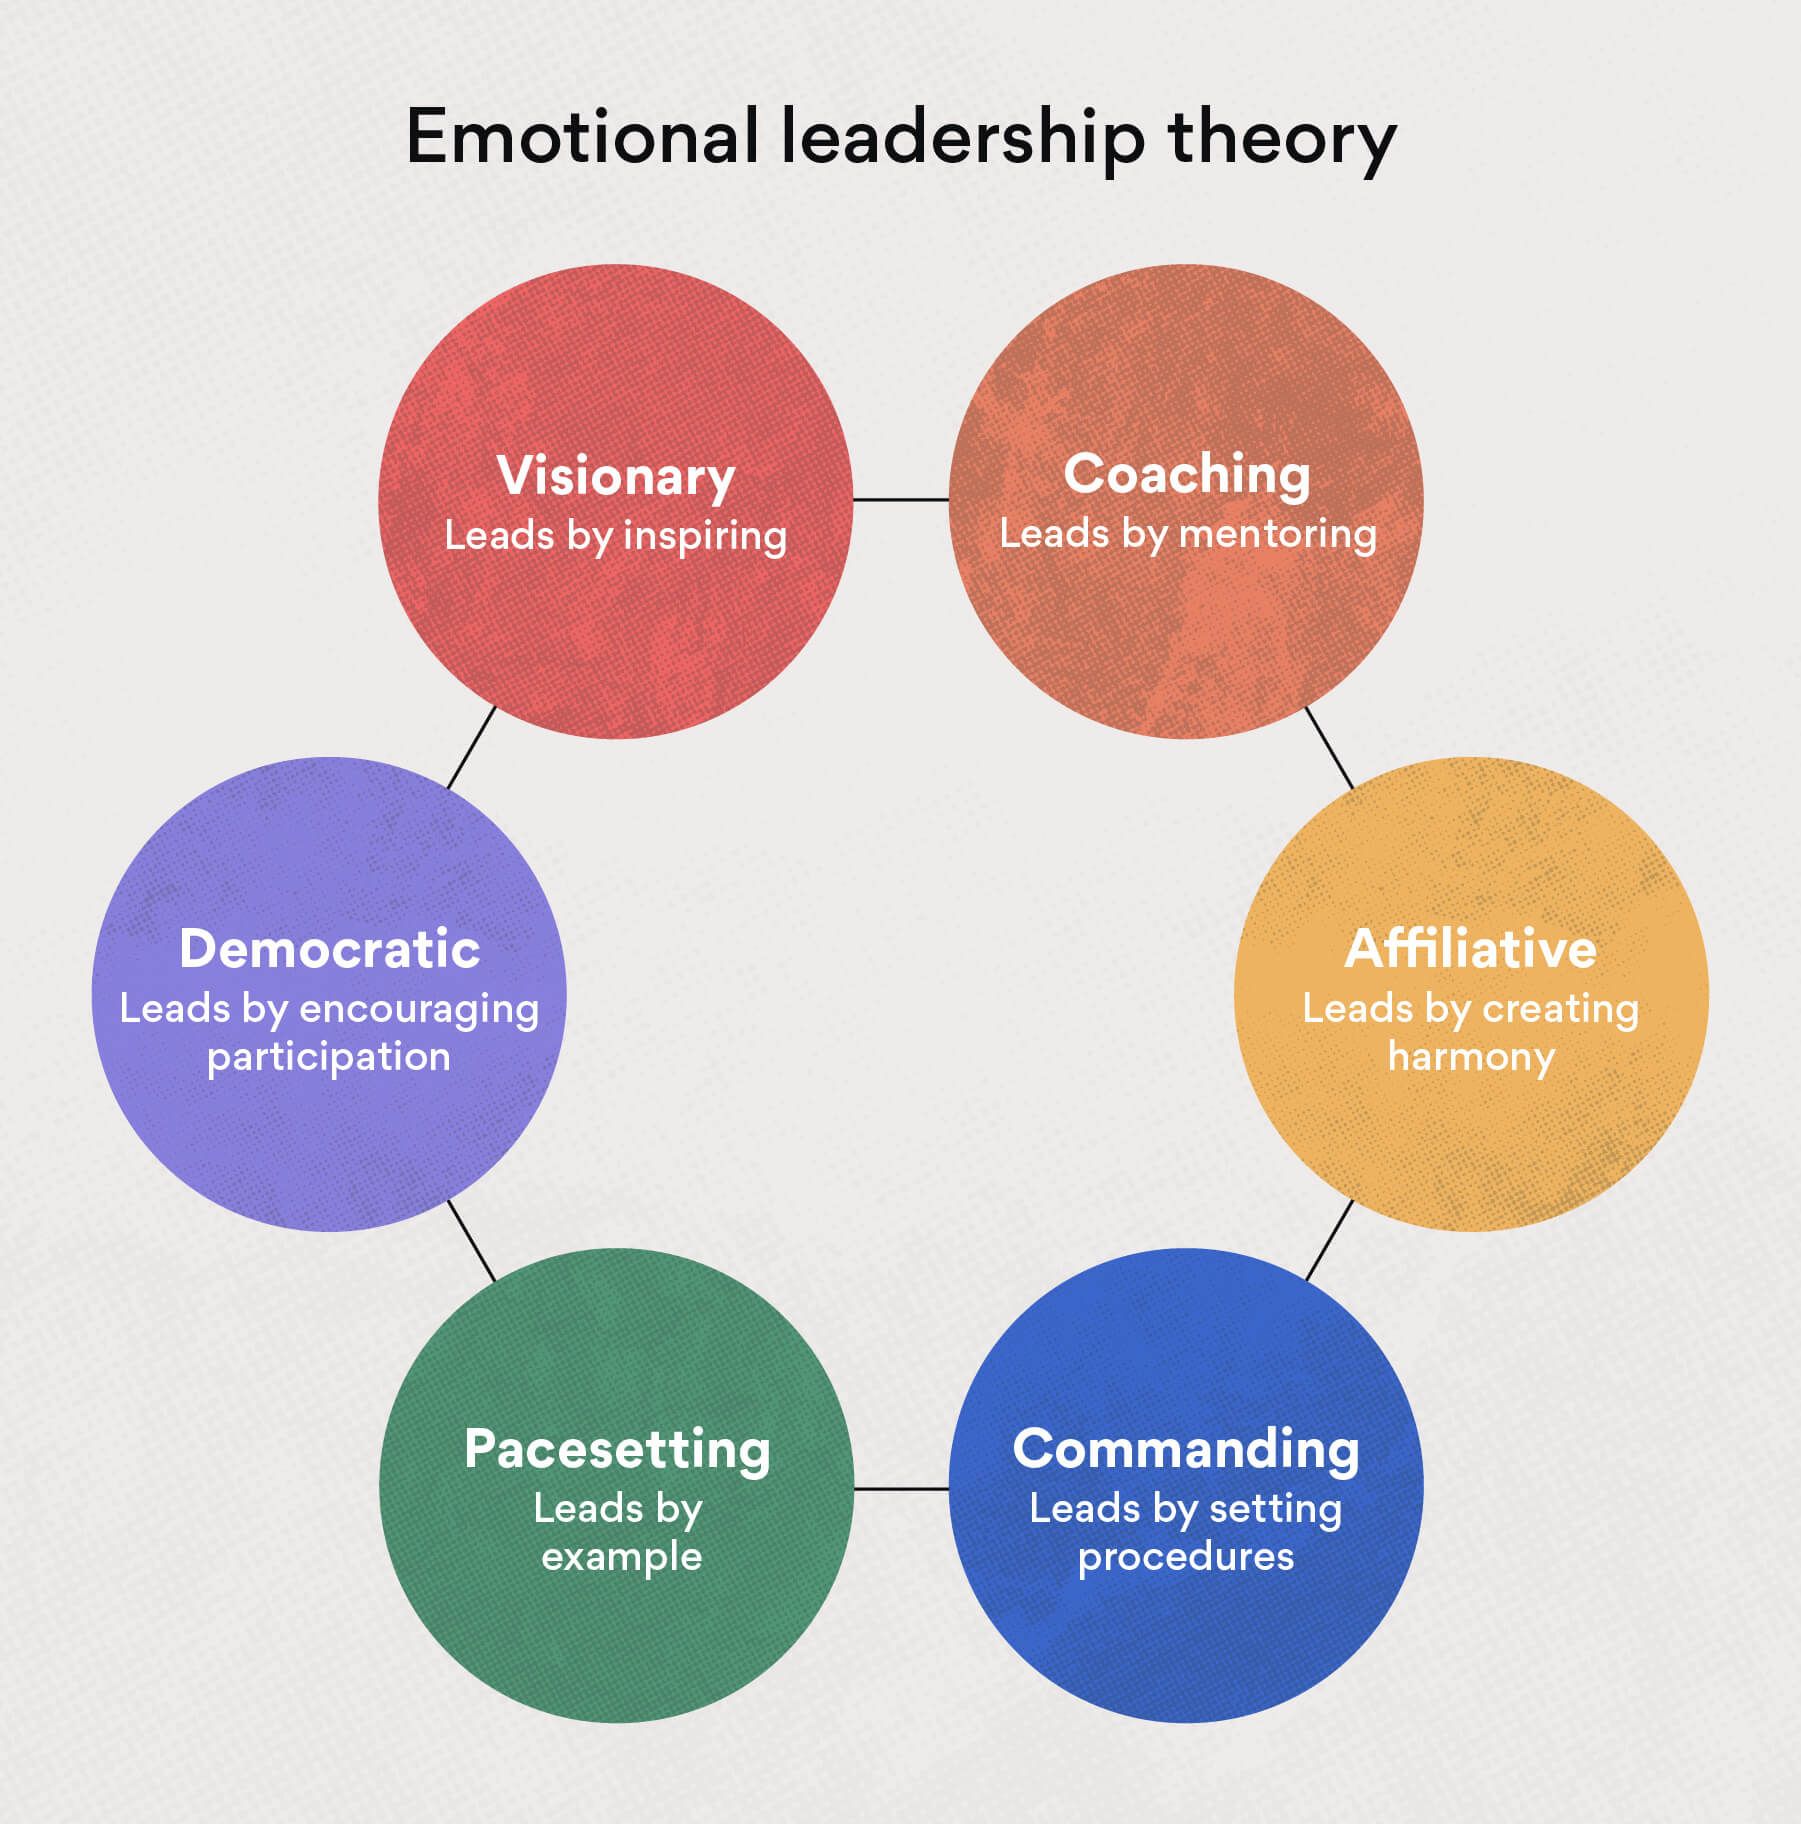 Emotional leadership theory